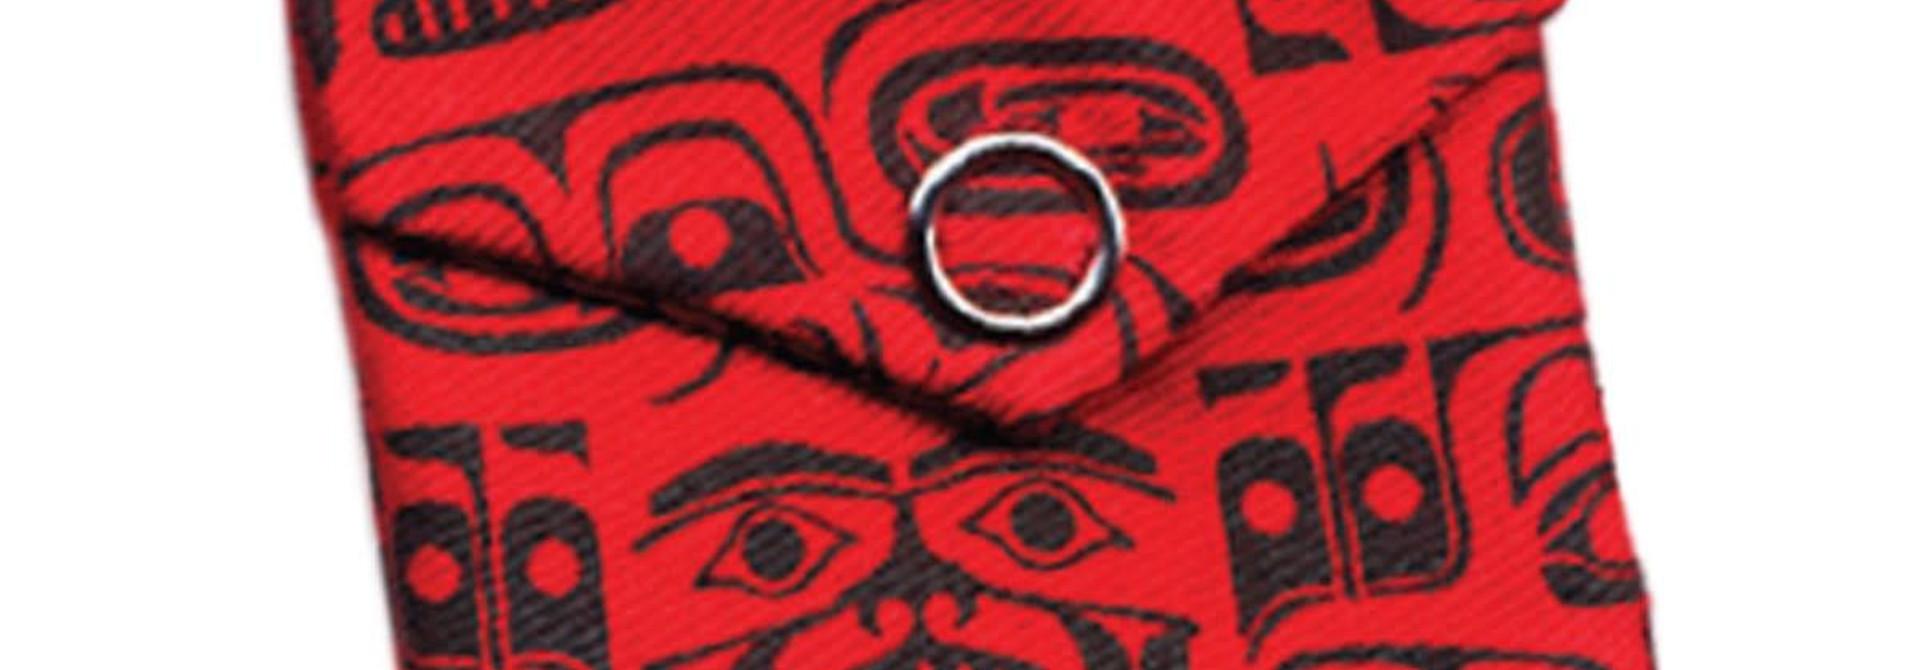 Pocket Spirit Pouch-Chilkat by Ryan Cranmer